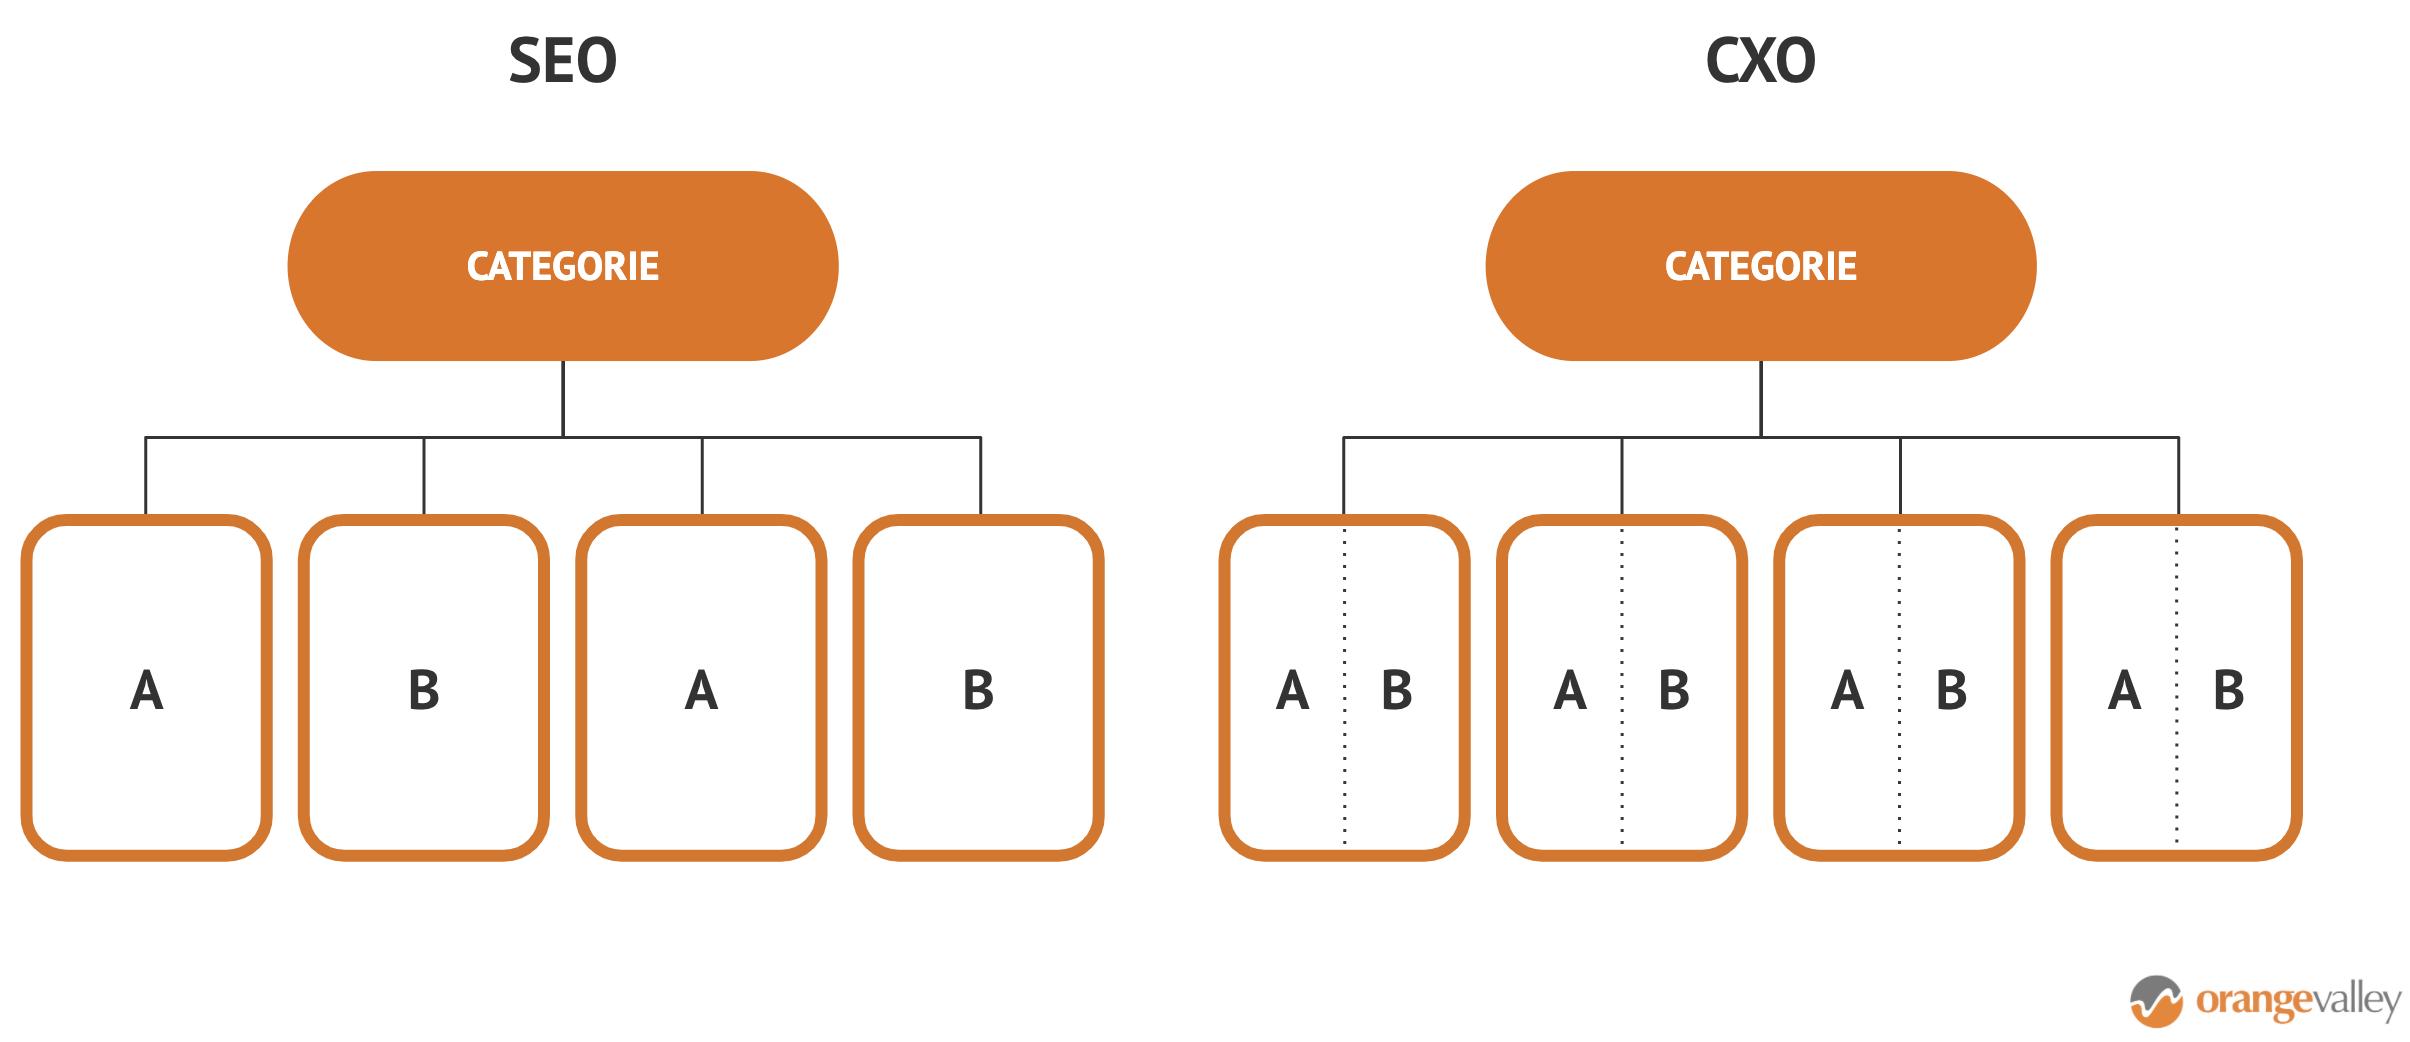 SEO vs. CXO A/B Testing